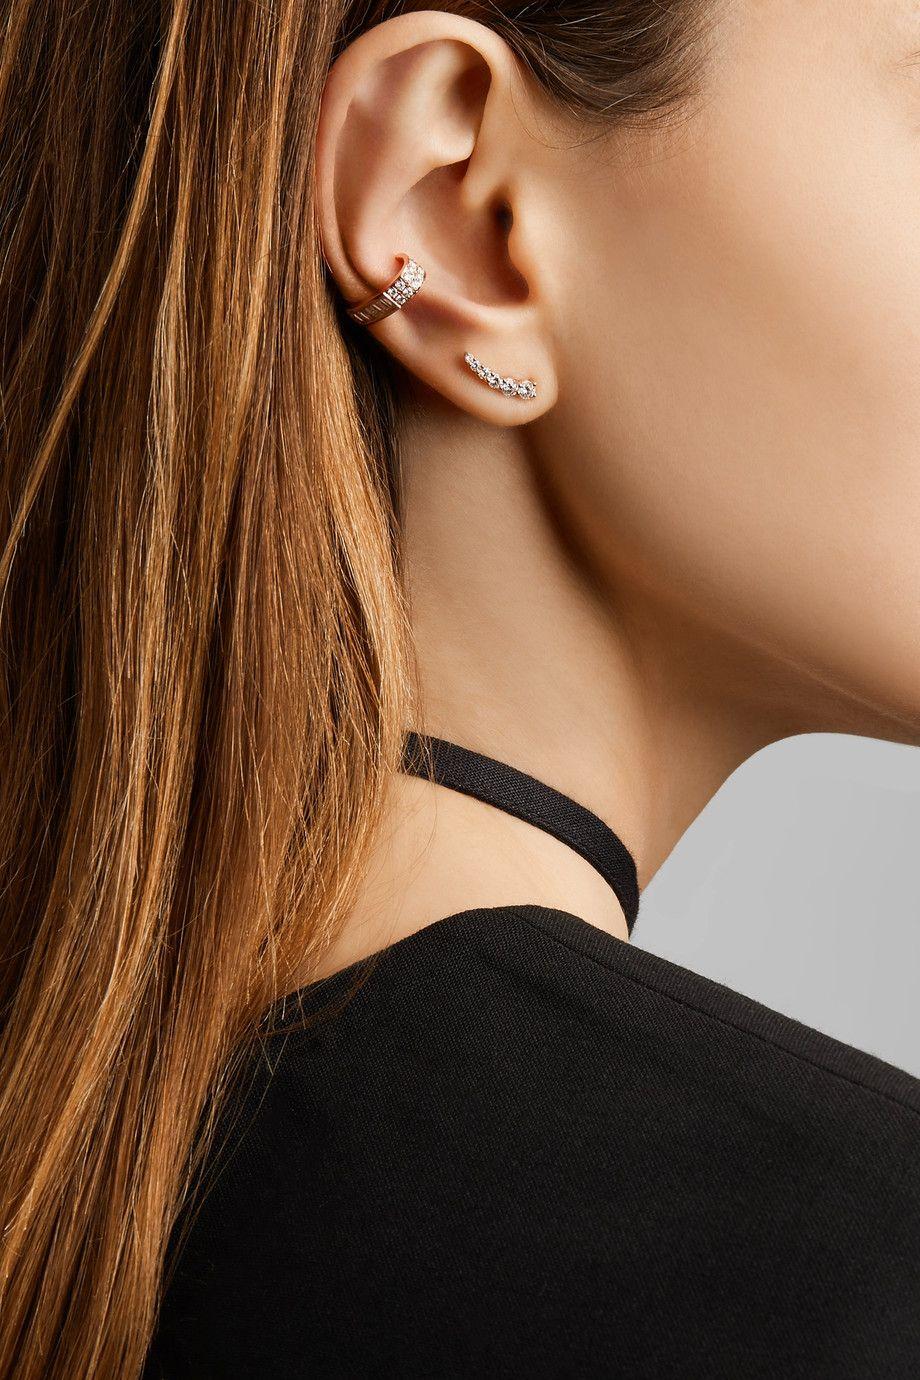 c0d45e1ea6682 Anita Ko - Floating 18-karat rose gold diamond earrings | Baubles ...